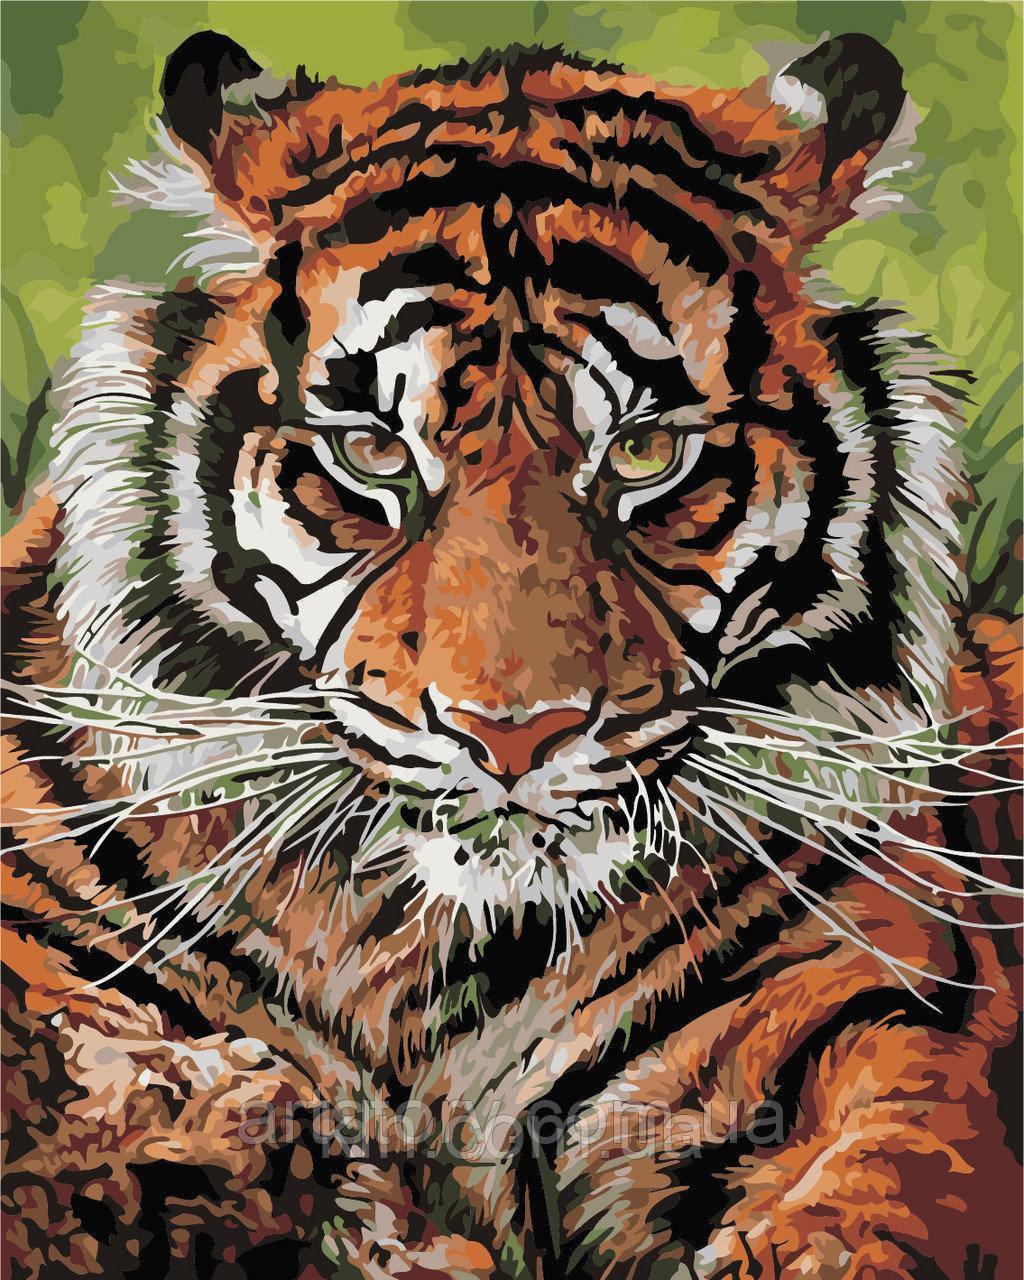 Картина по номерам ArtStory Взгляд тигра 40 х 50 см (арт. AS0393)